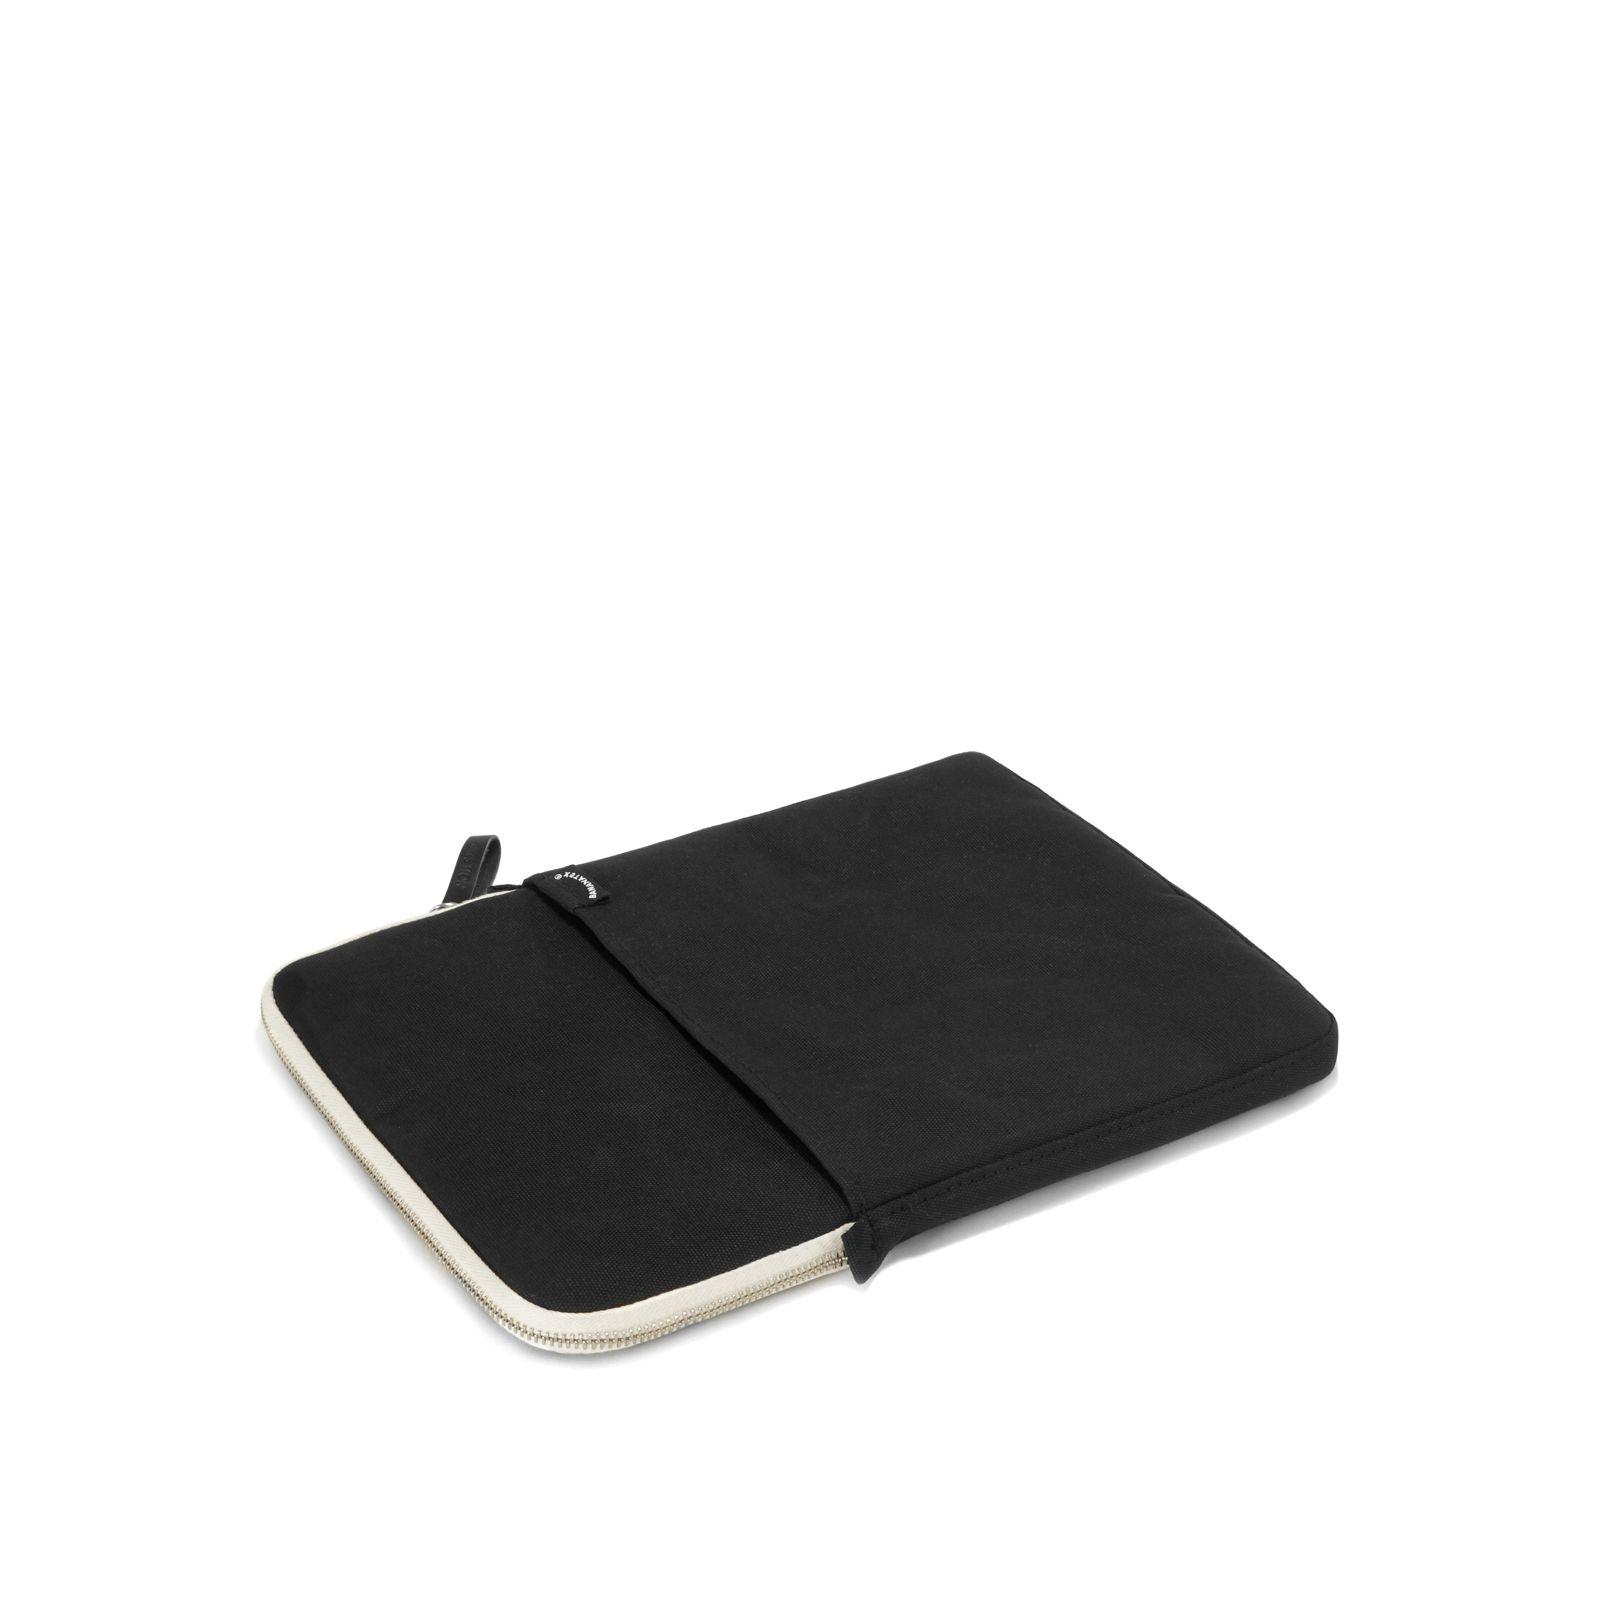 Bananatex Sleeve for Macbook 13